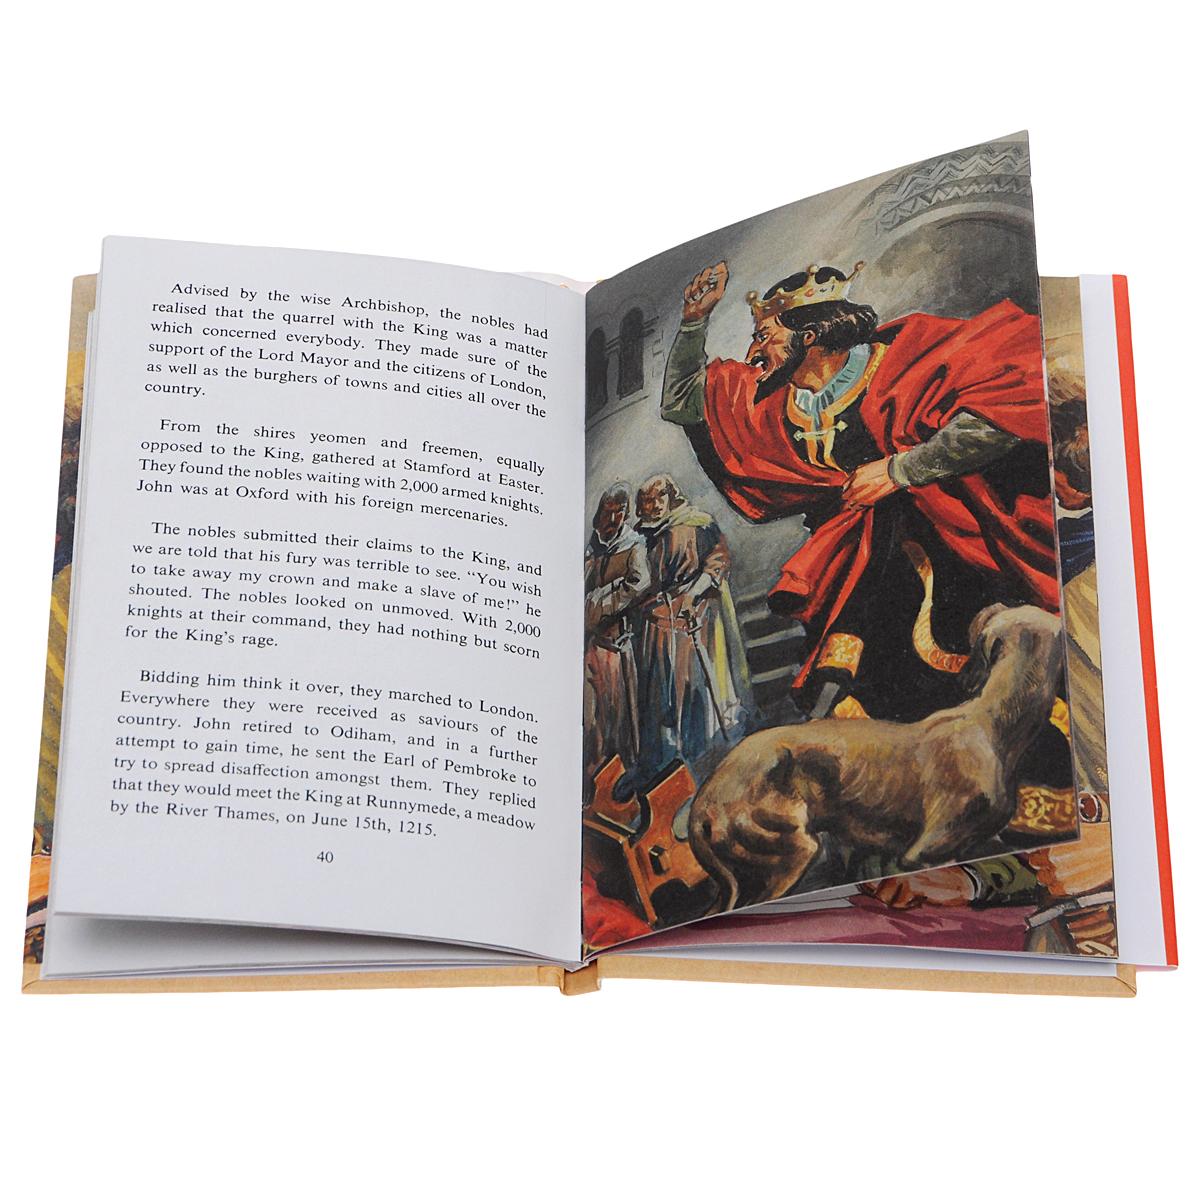 King John and Magna Carta: A Ladybird Adventure from History Book